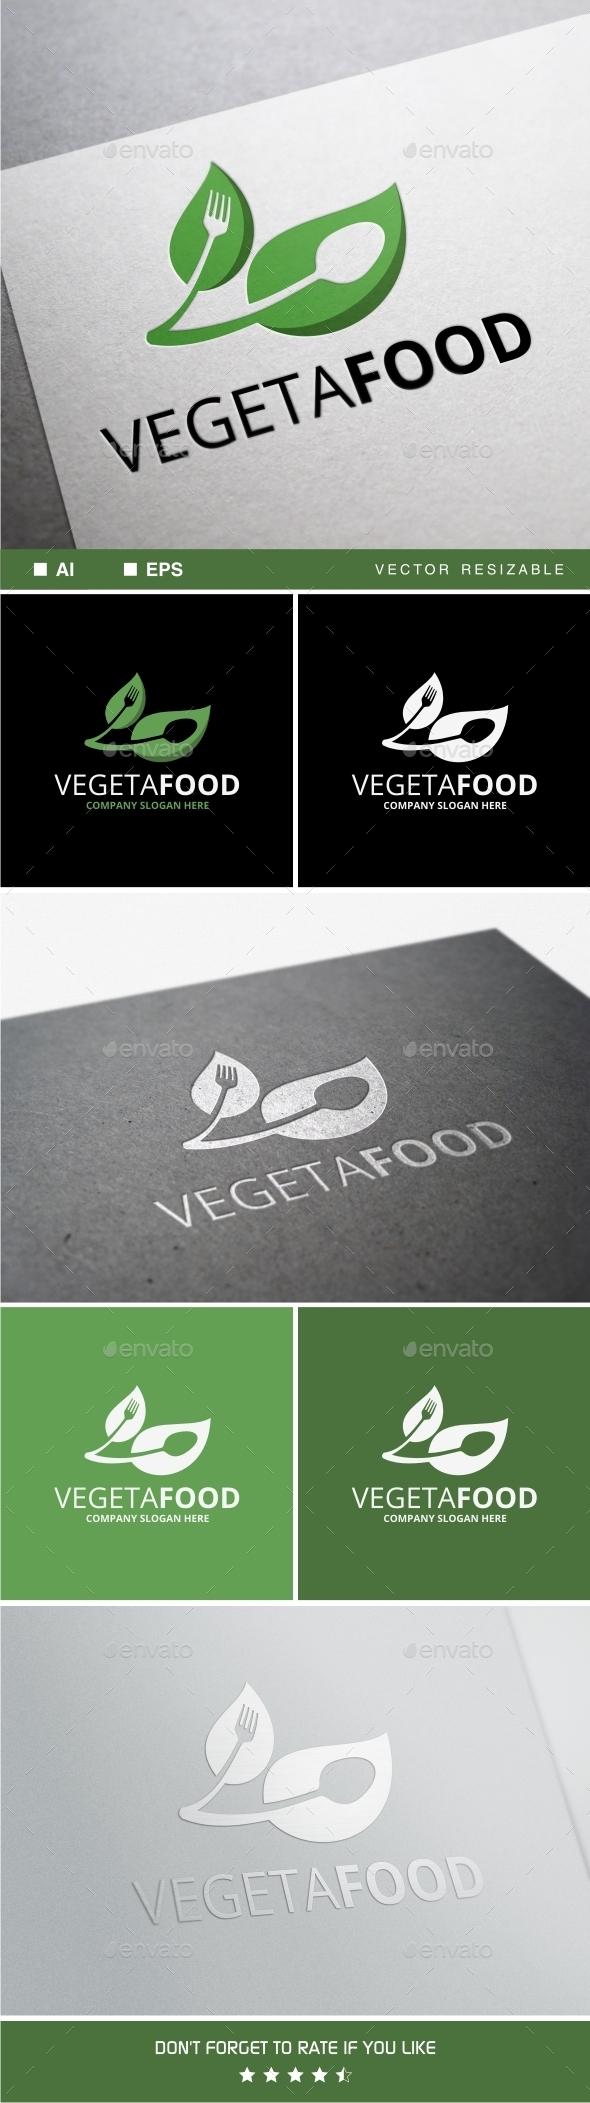 GraphicRiver Vegetafood Logo 11254565